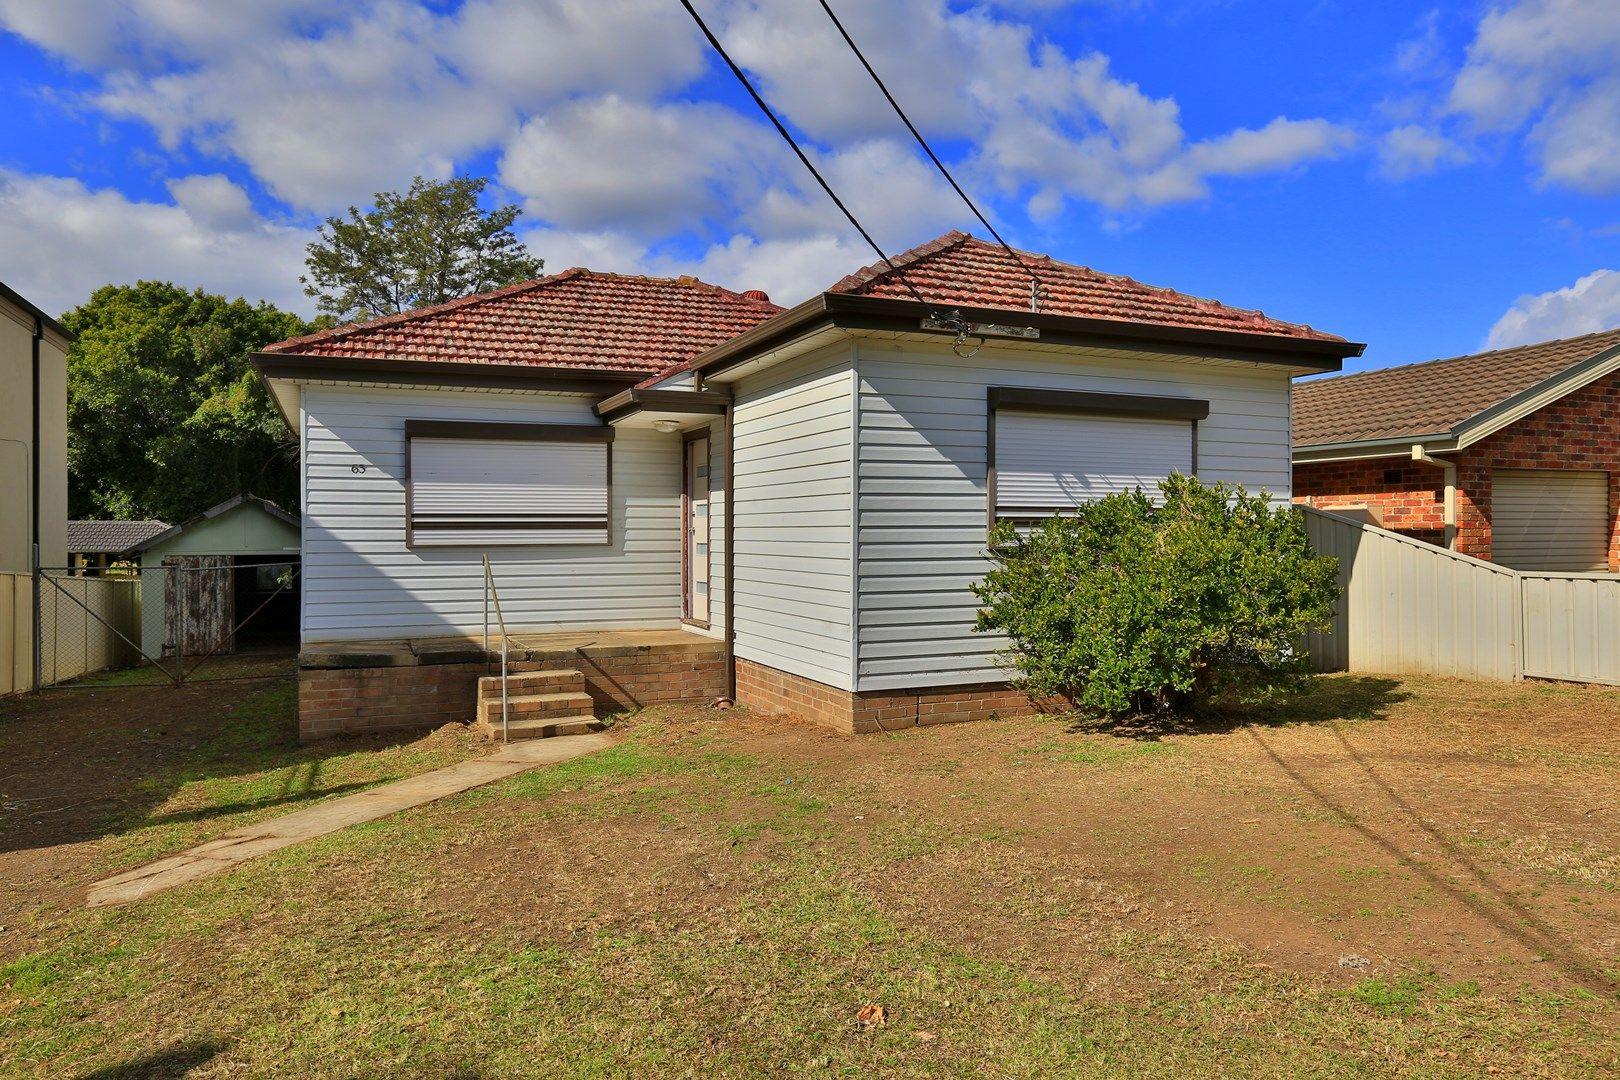 63 Australia Street, Bass Hill NSW 2197, Image 0